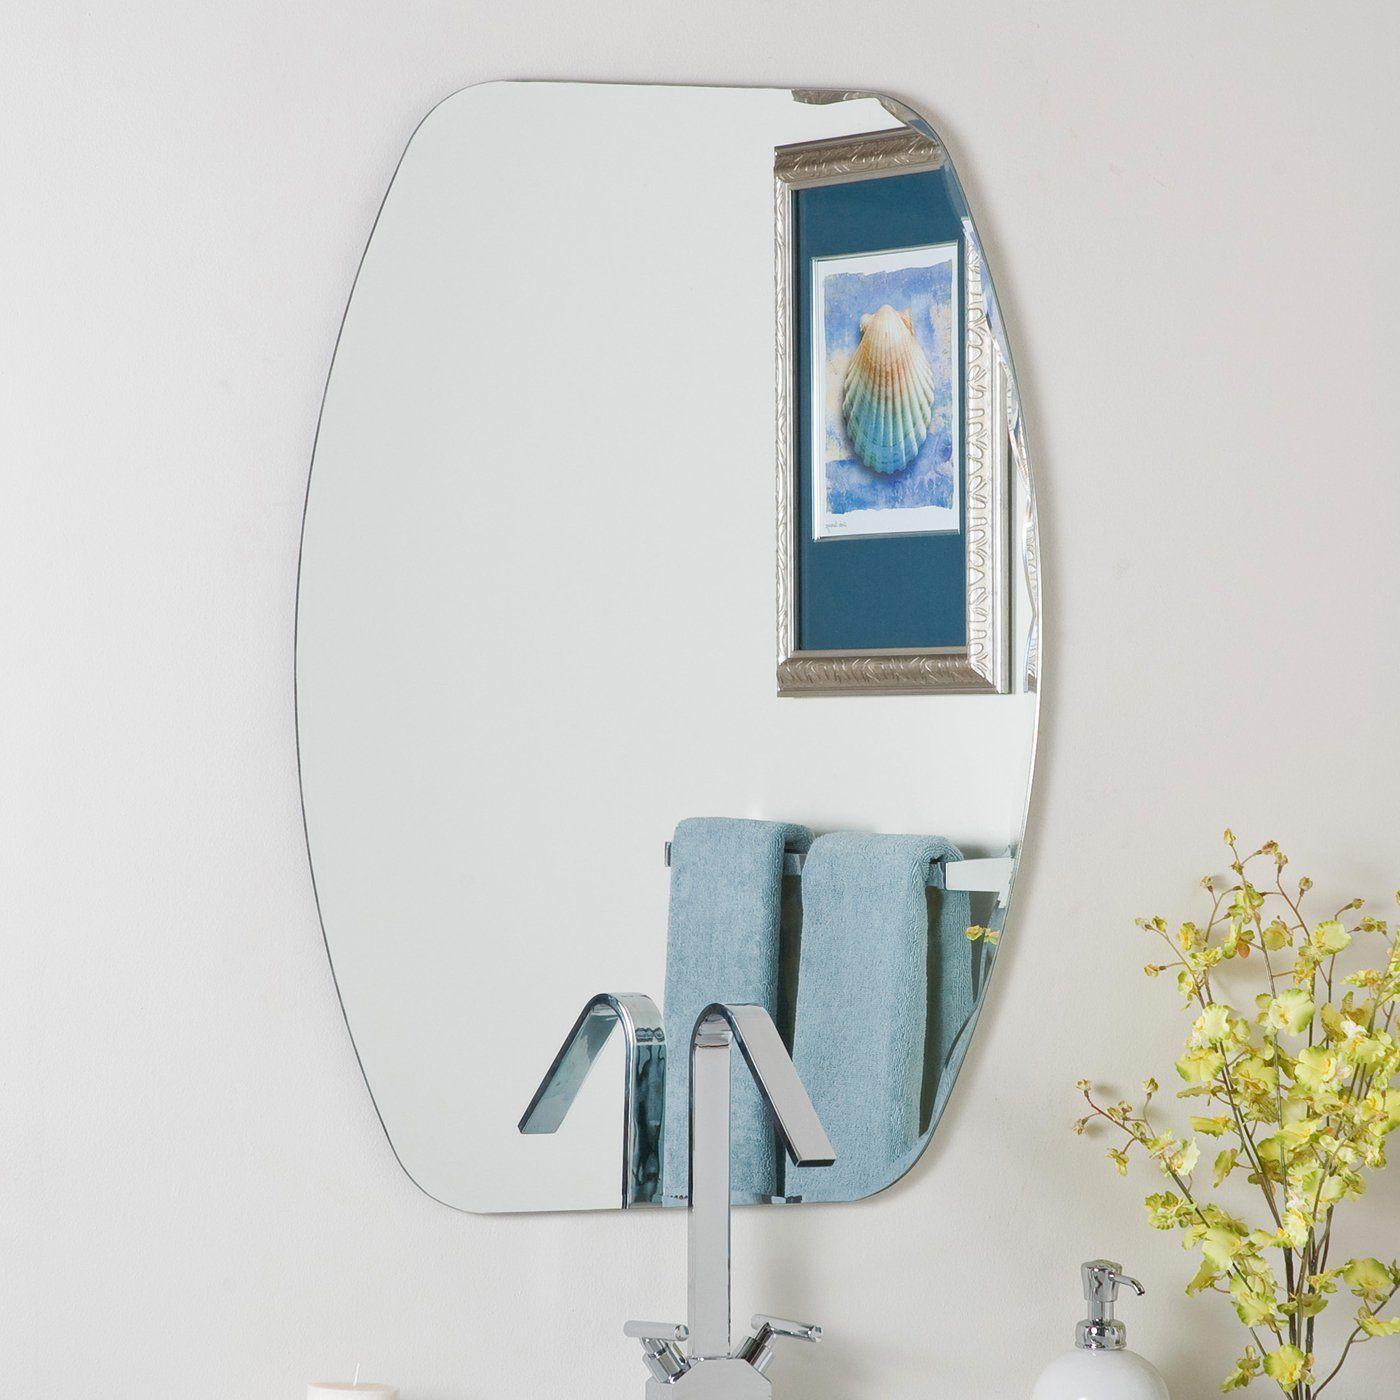 Decor Wonderland SSM308 Frameless Oval Beveled Mirror